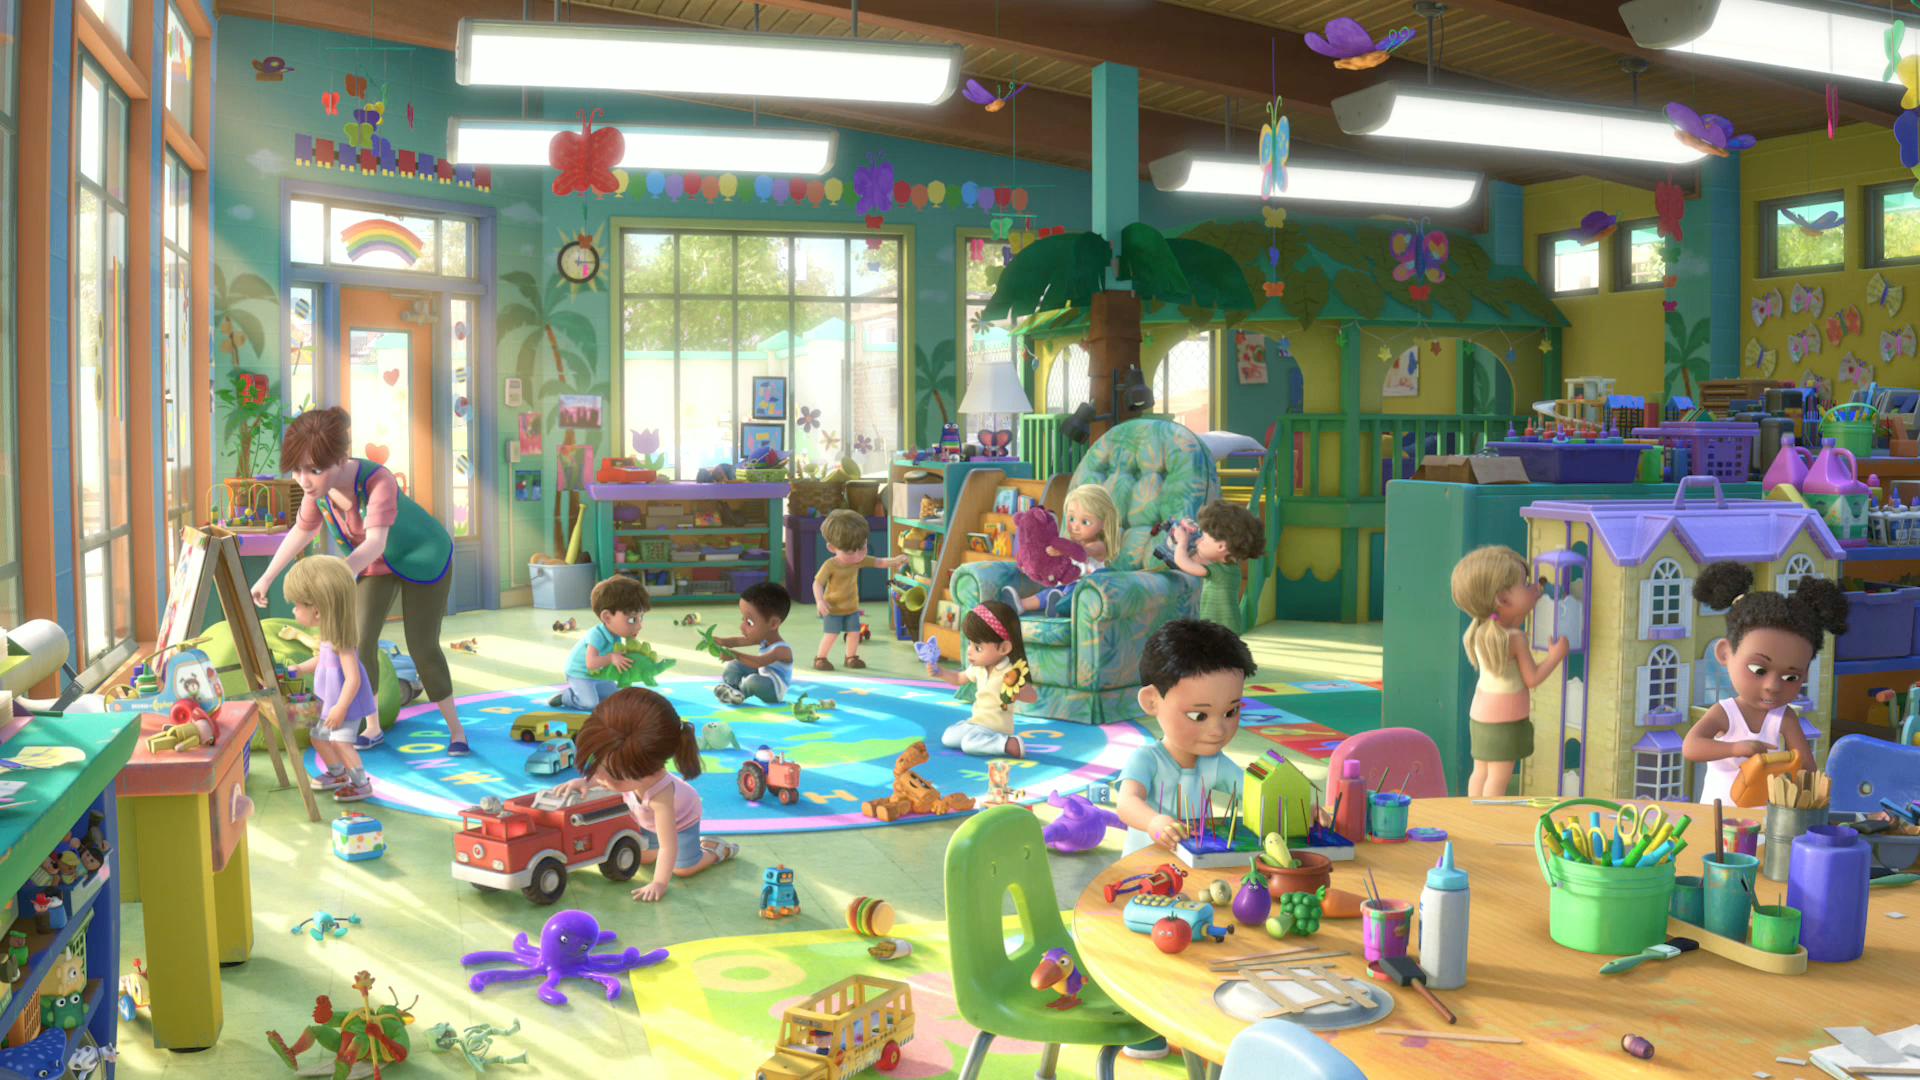 http://vignette4.wikia.nocookie.net/pixar/images/c/c8/Toystory3atrailer25.png/revision/latest?cb=20100211205828